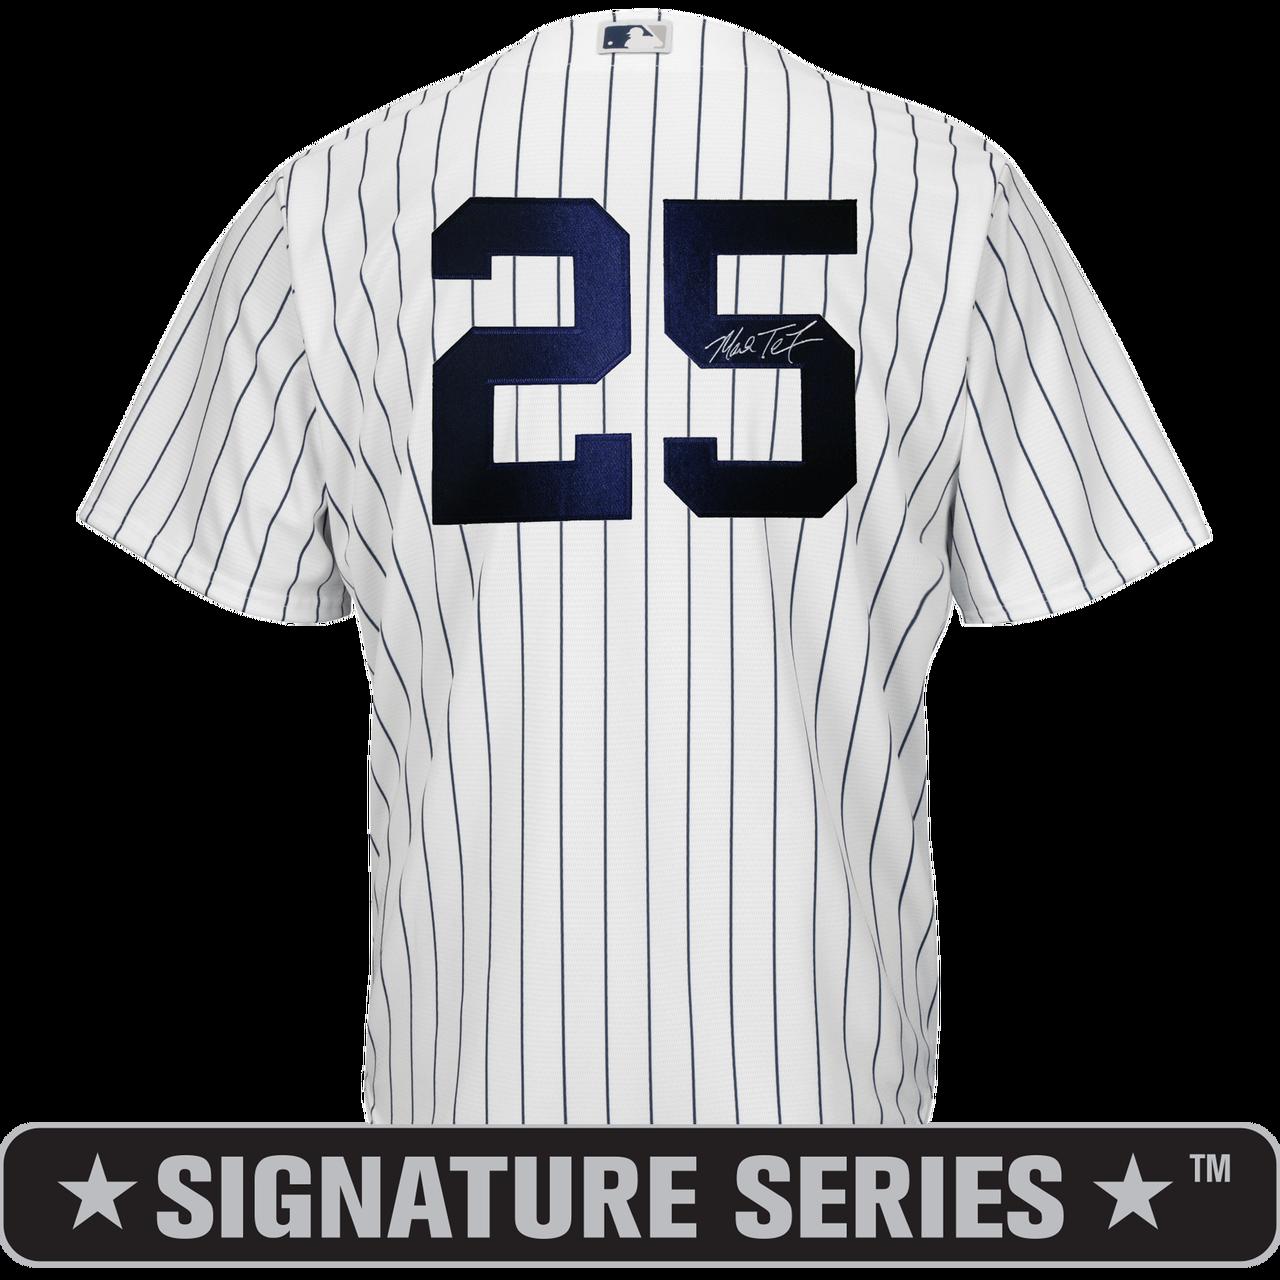 Mark Teixeira Signature Series No Name Jersey - NY Yankees Replica Adult Home Jersey